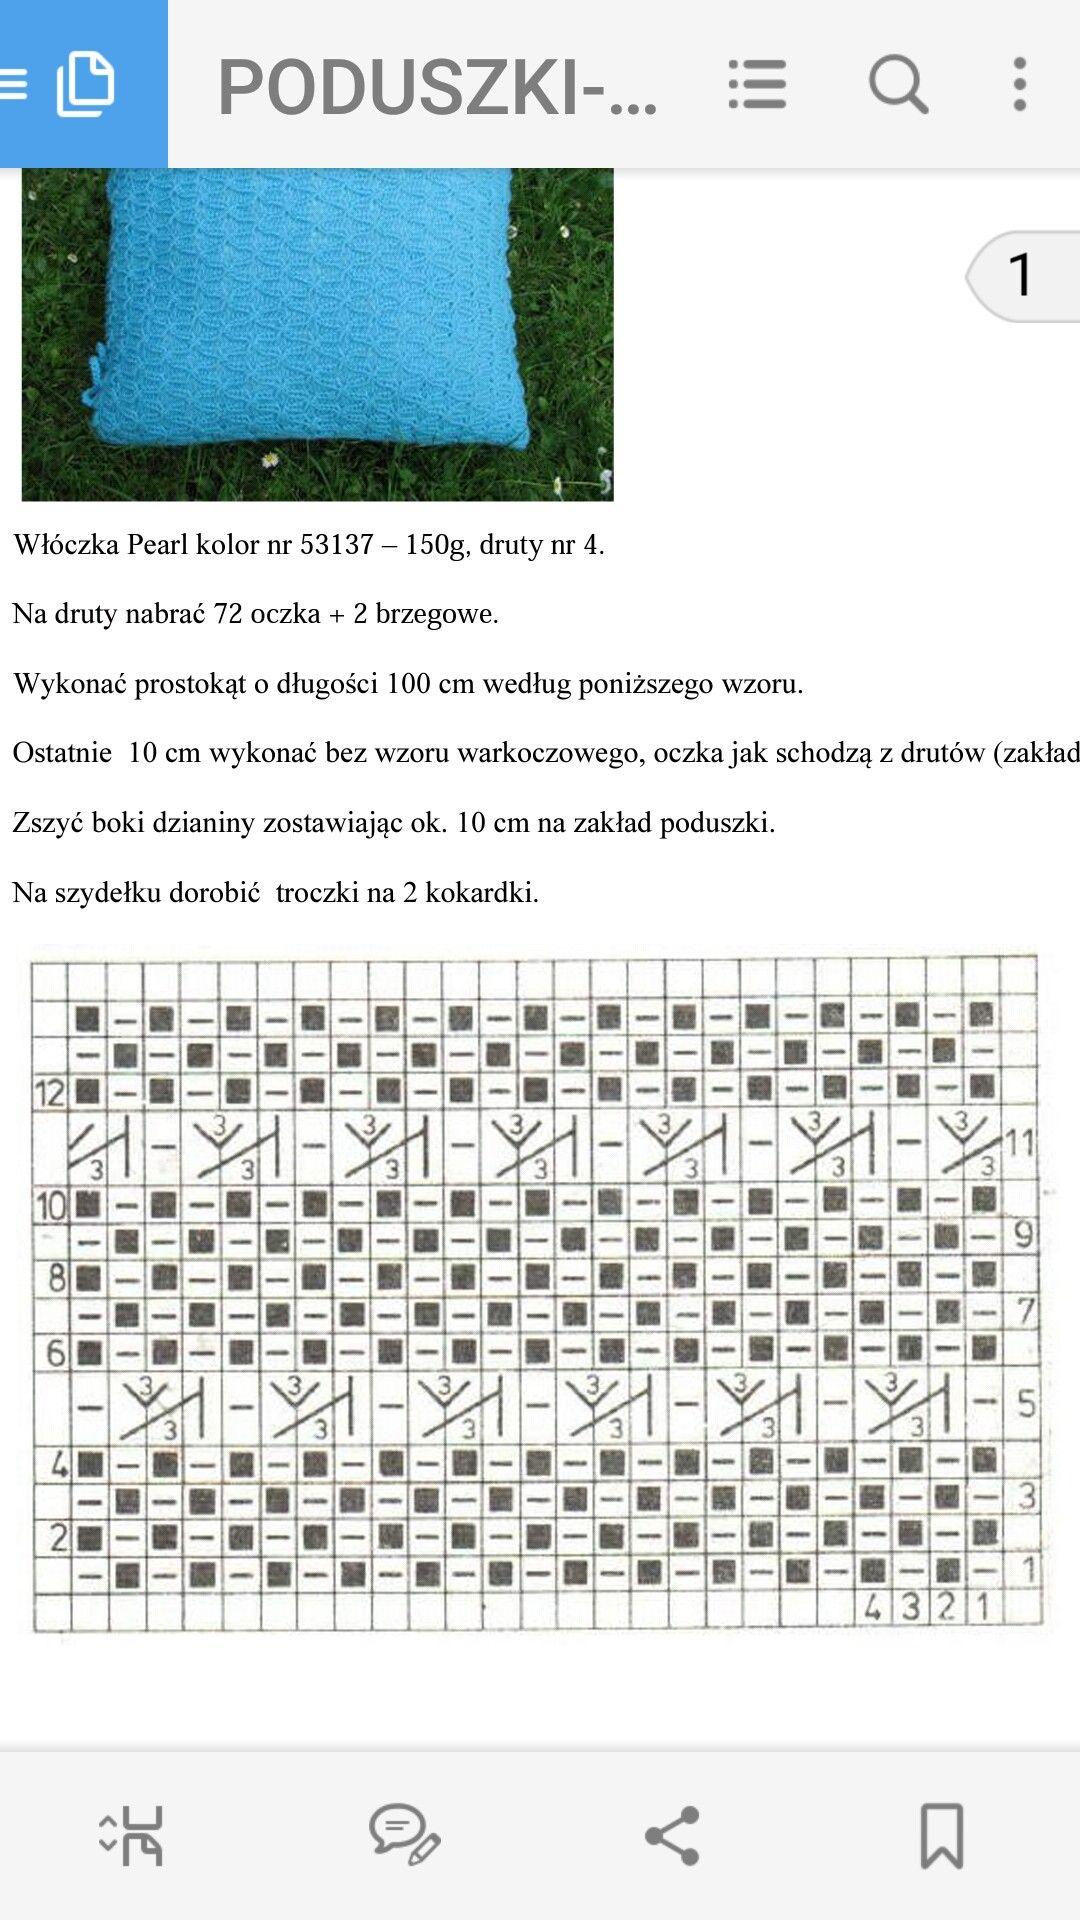 Pin By Marijke Van Der Burg On Crochet Pillows Pinterest Chevron Pattern Diagram Mantas Pillow Crocheting